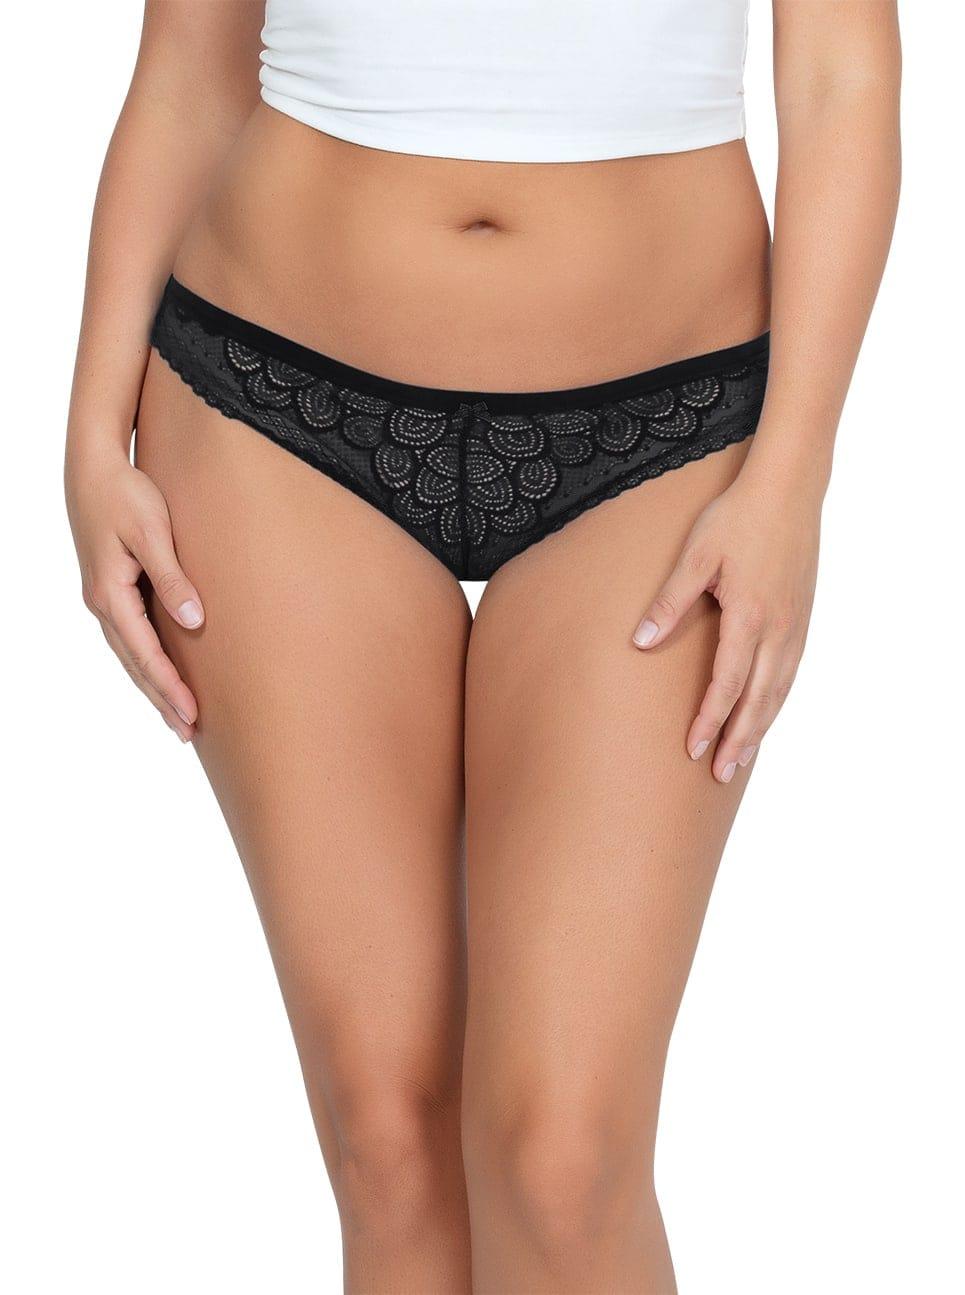 ParfaitPanty SoGlam ThongPP402 black front - Panty So Glam Thong - Black - PP402